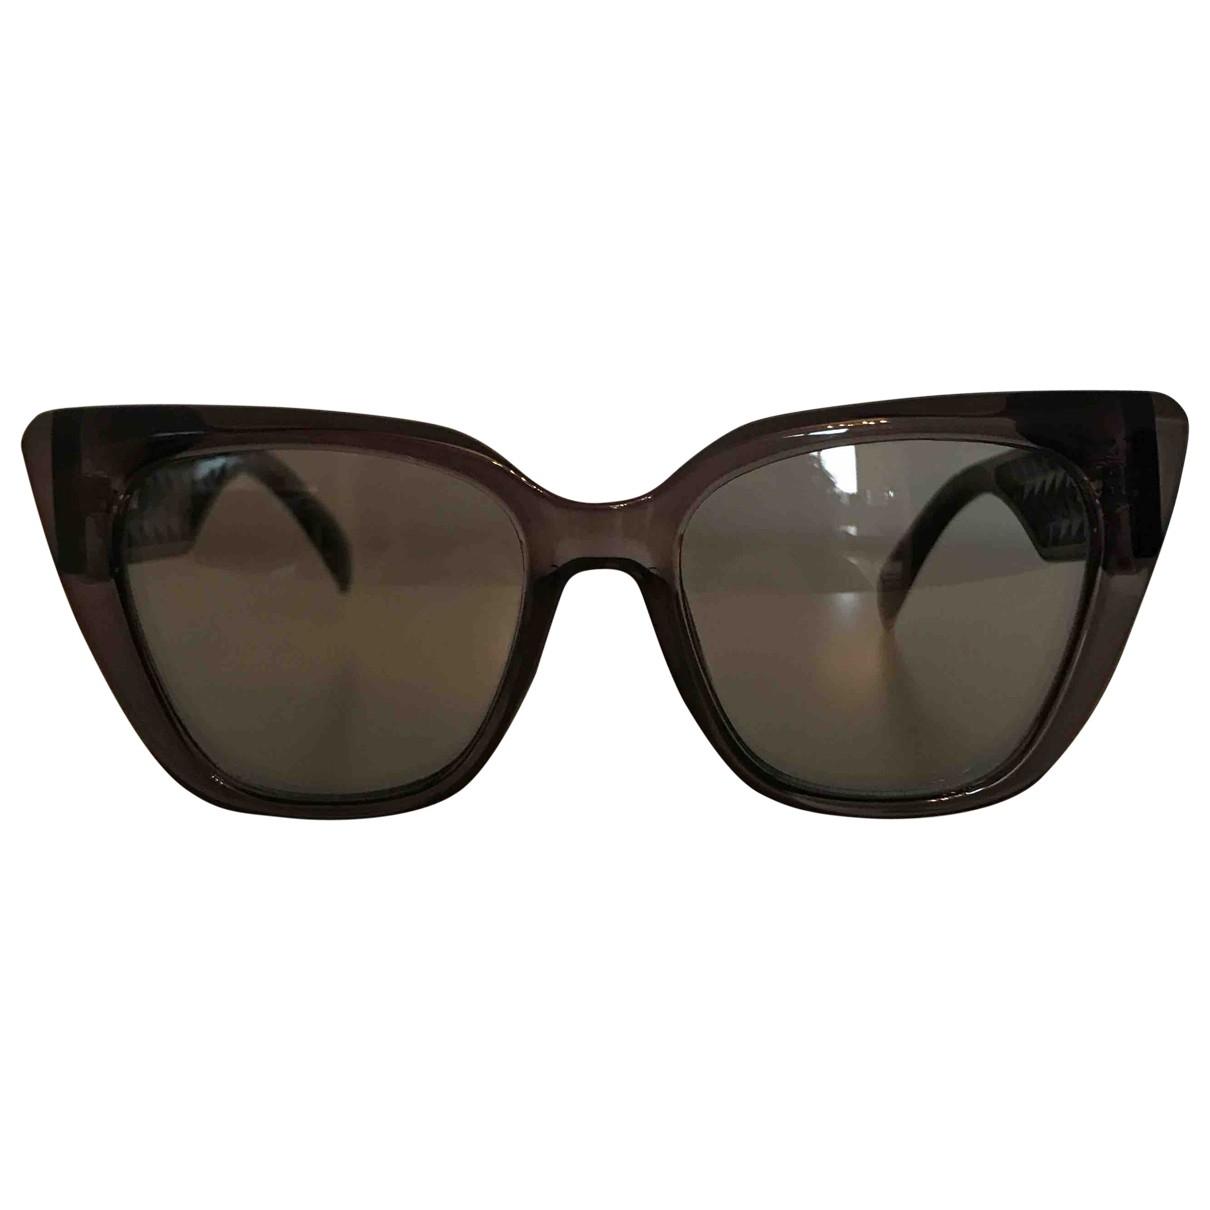 Gafas oversize Just Cavalli